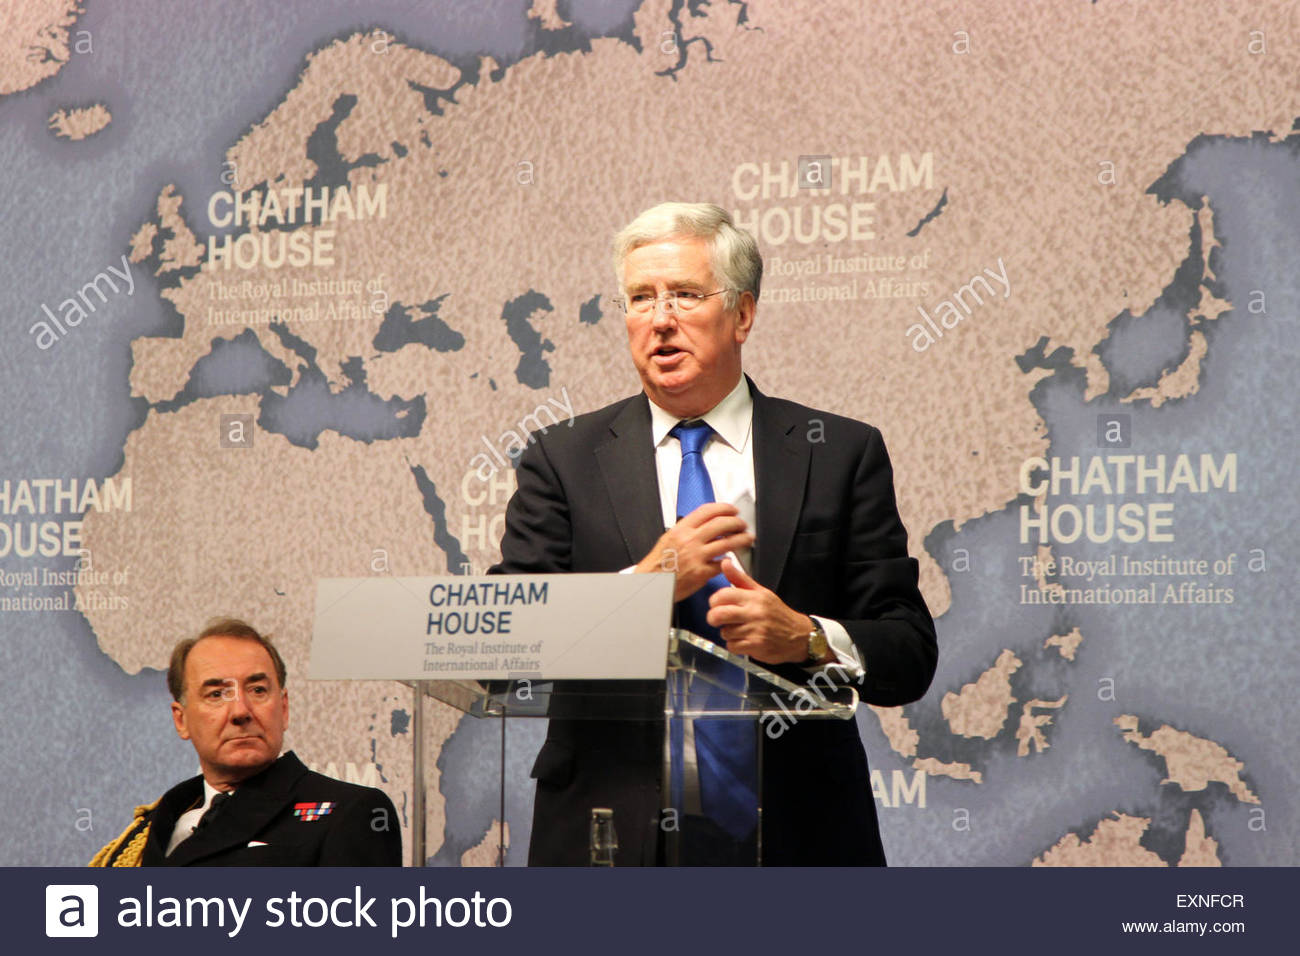 London, United Kingdom. 15th July, 2015. UK Defence Secretary Michael Fallon addresses a meeting at Chatham House Stock Photo